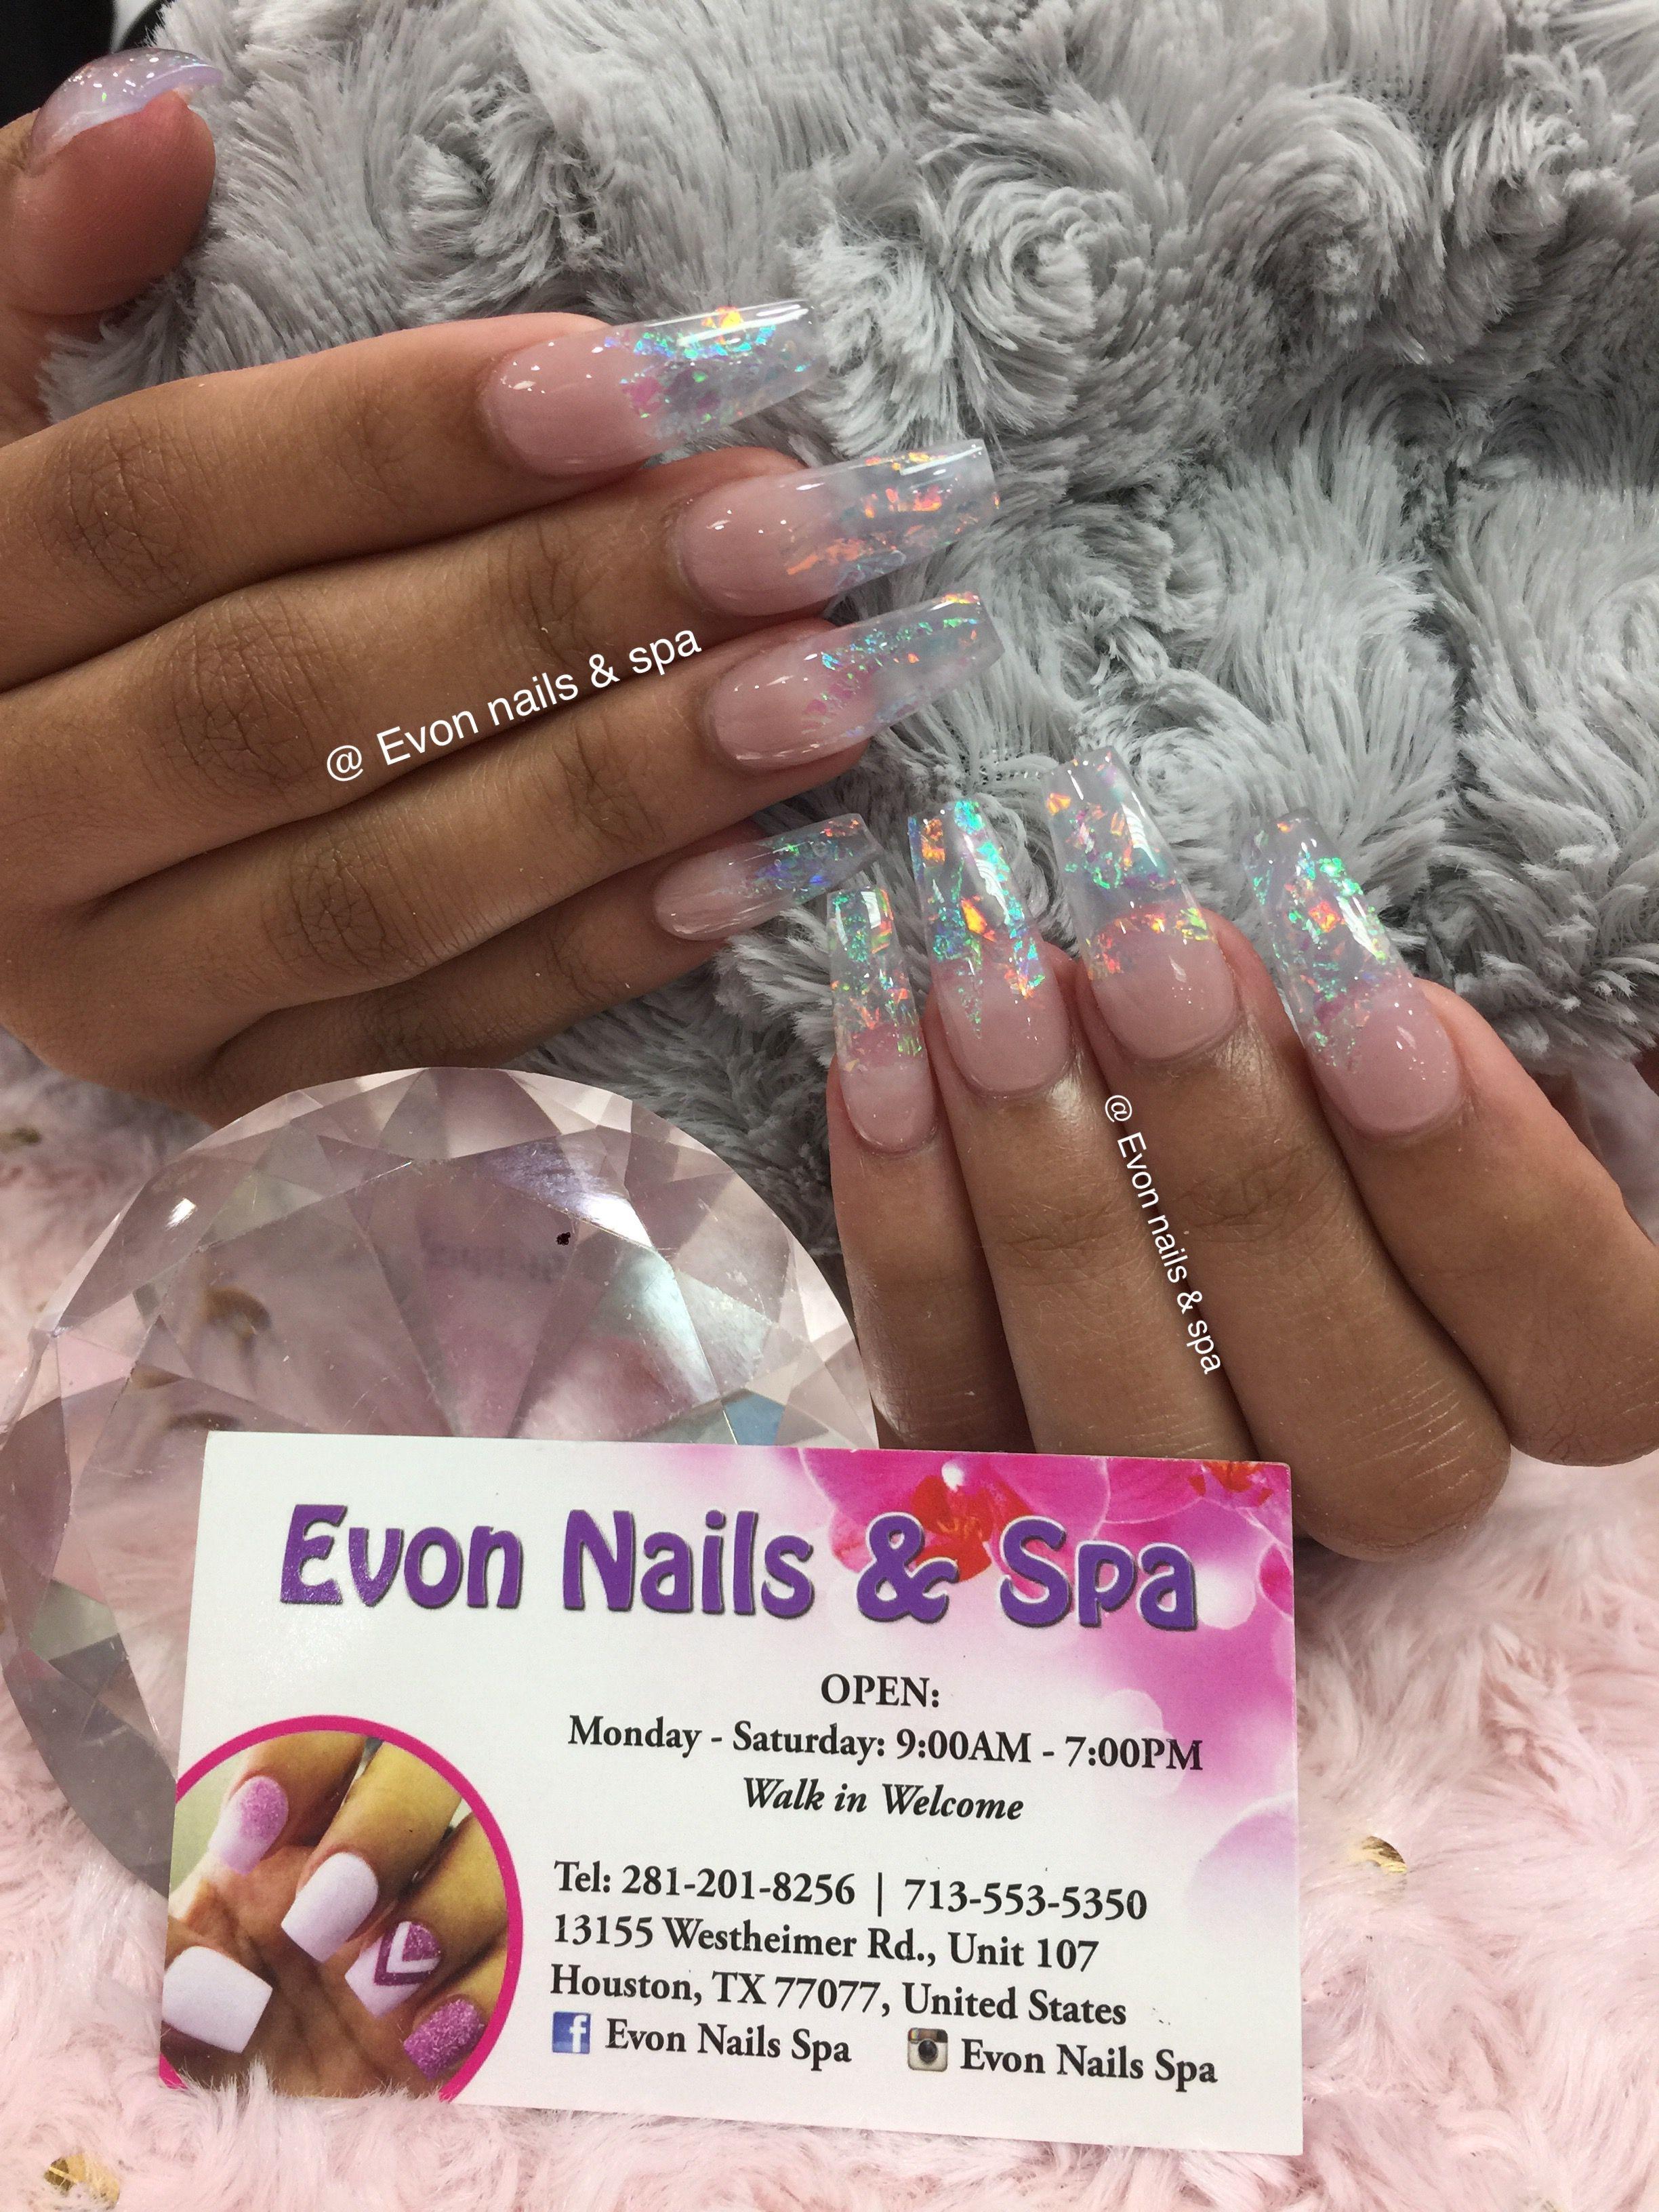 Pin By Evon Nails Spa On Evon Nails Spa Instagram Evon Nails Spa Facebook Evon Nails My Nails Nails Nail Spa